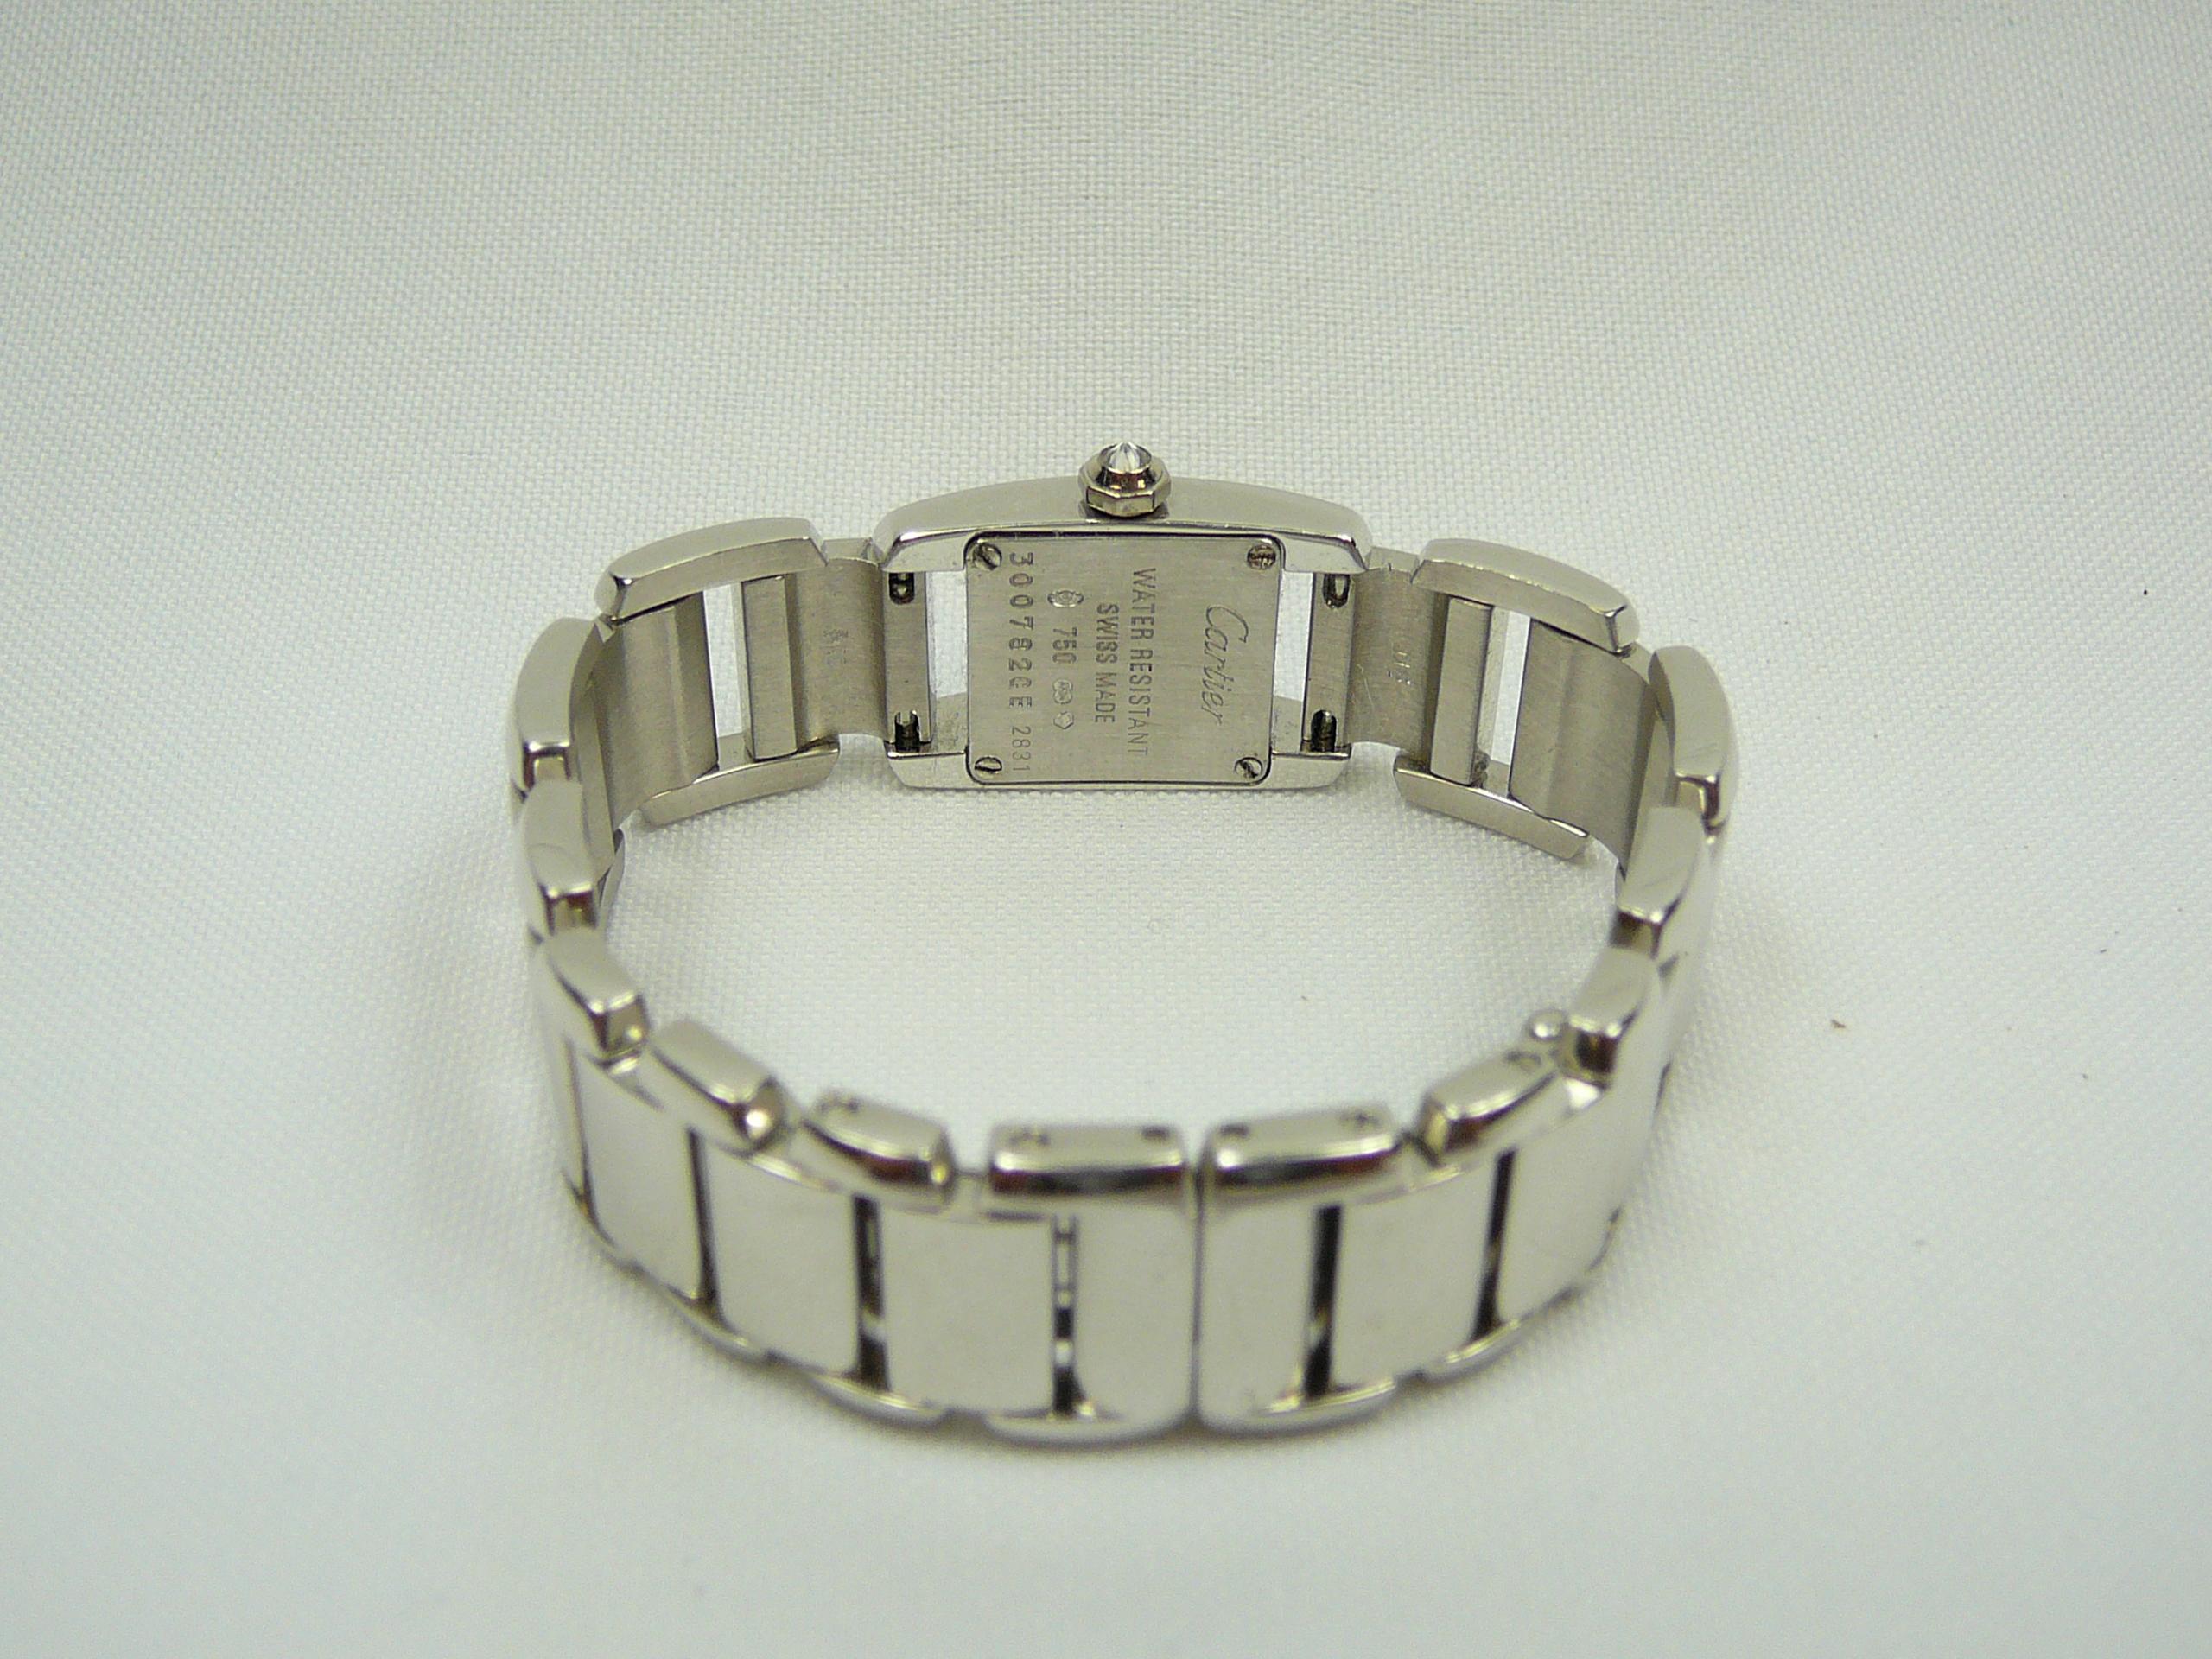 Ladies Gold Cartier Wrist Watch - Image 5 of 5